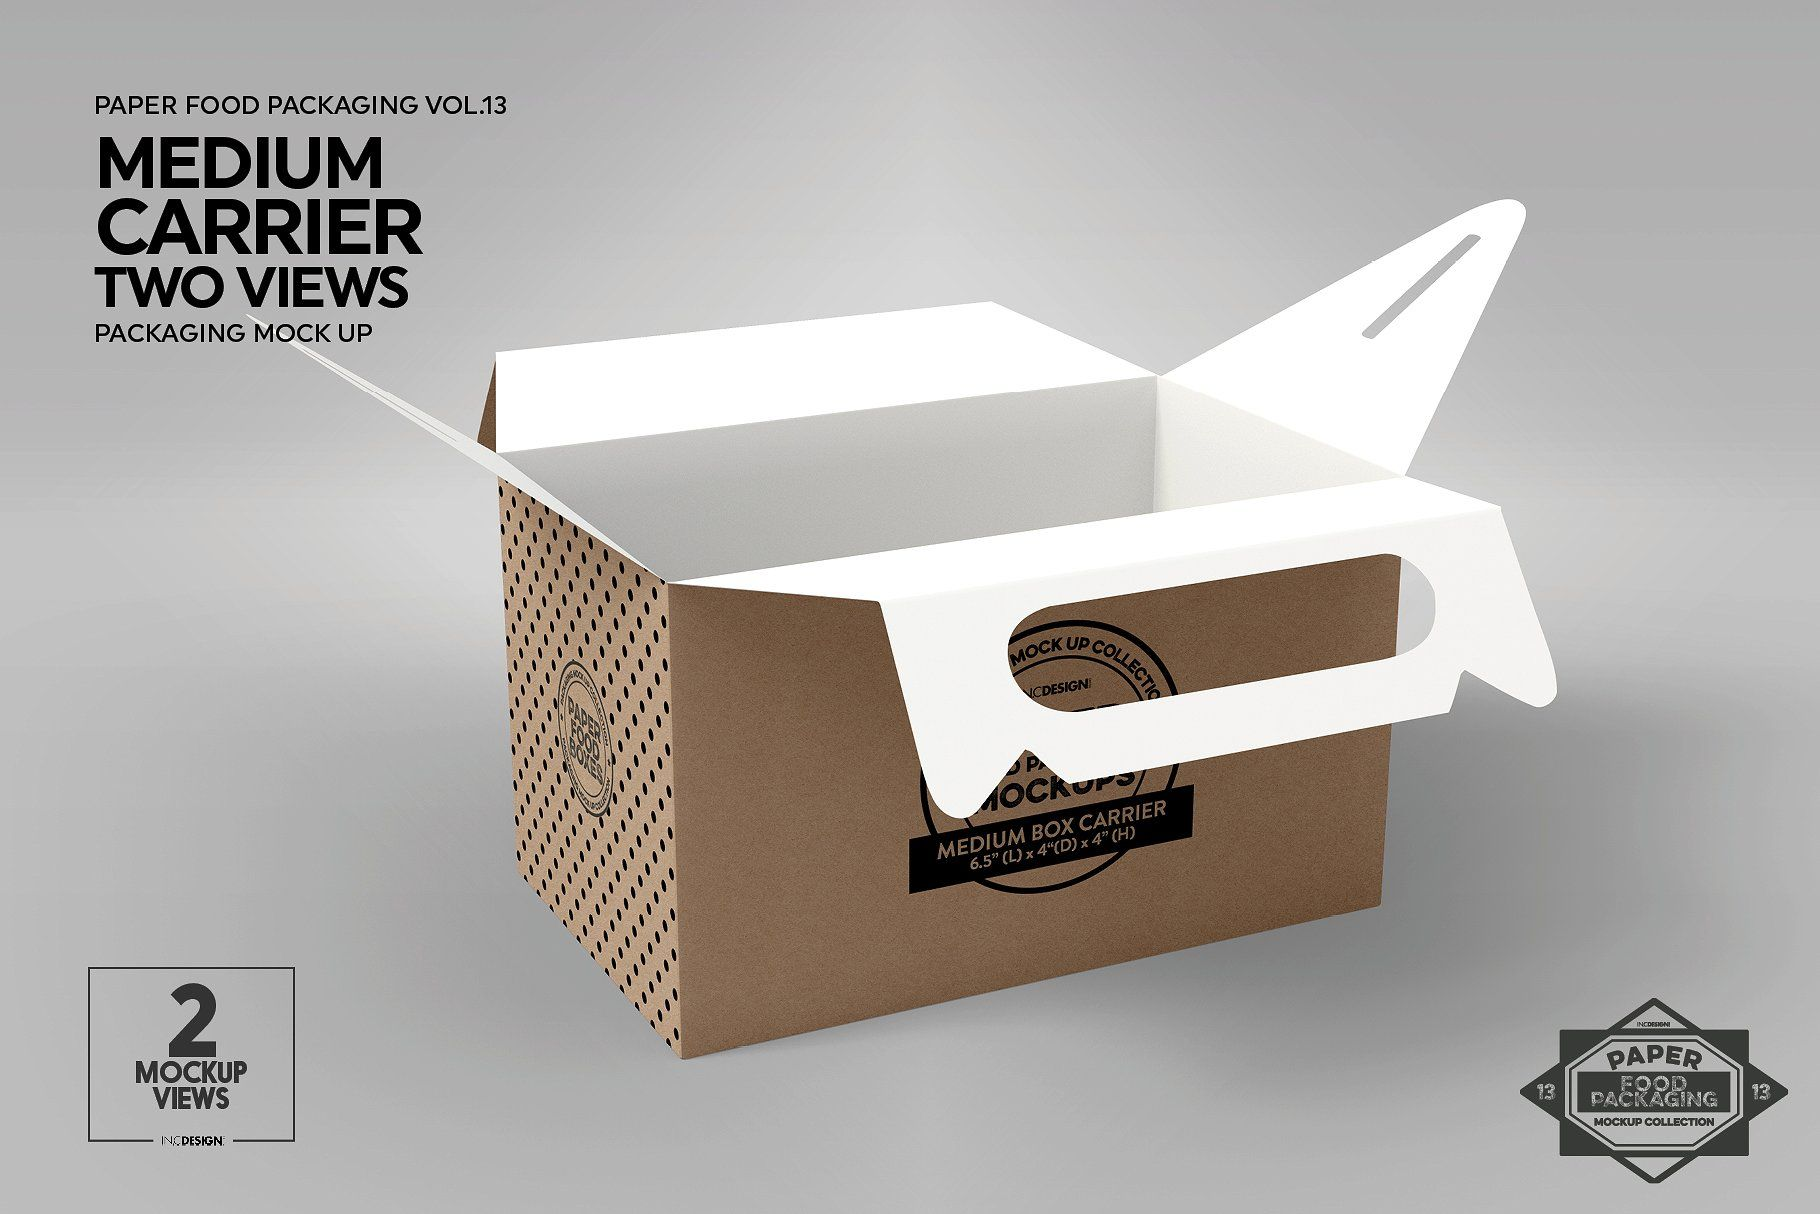 Download Medium Box Carrier Packaging Mockup Packaging Mockup Free Packaging Mockup Branding Template